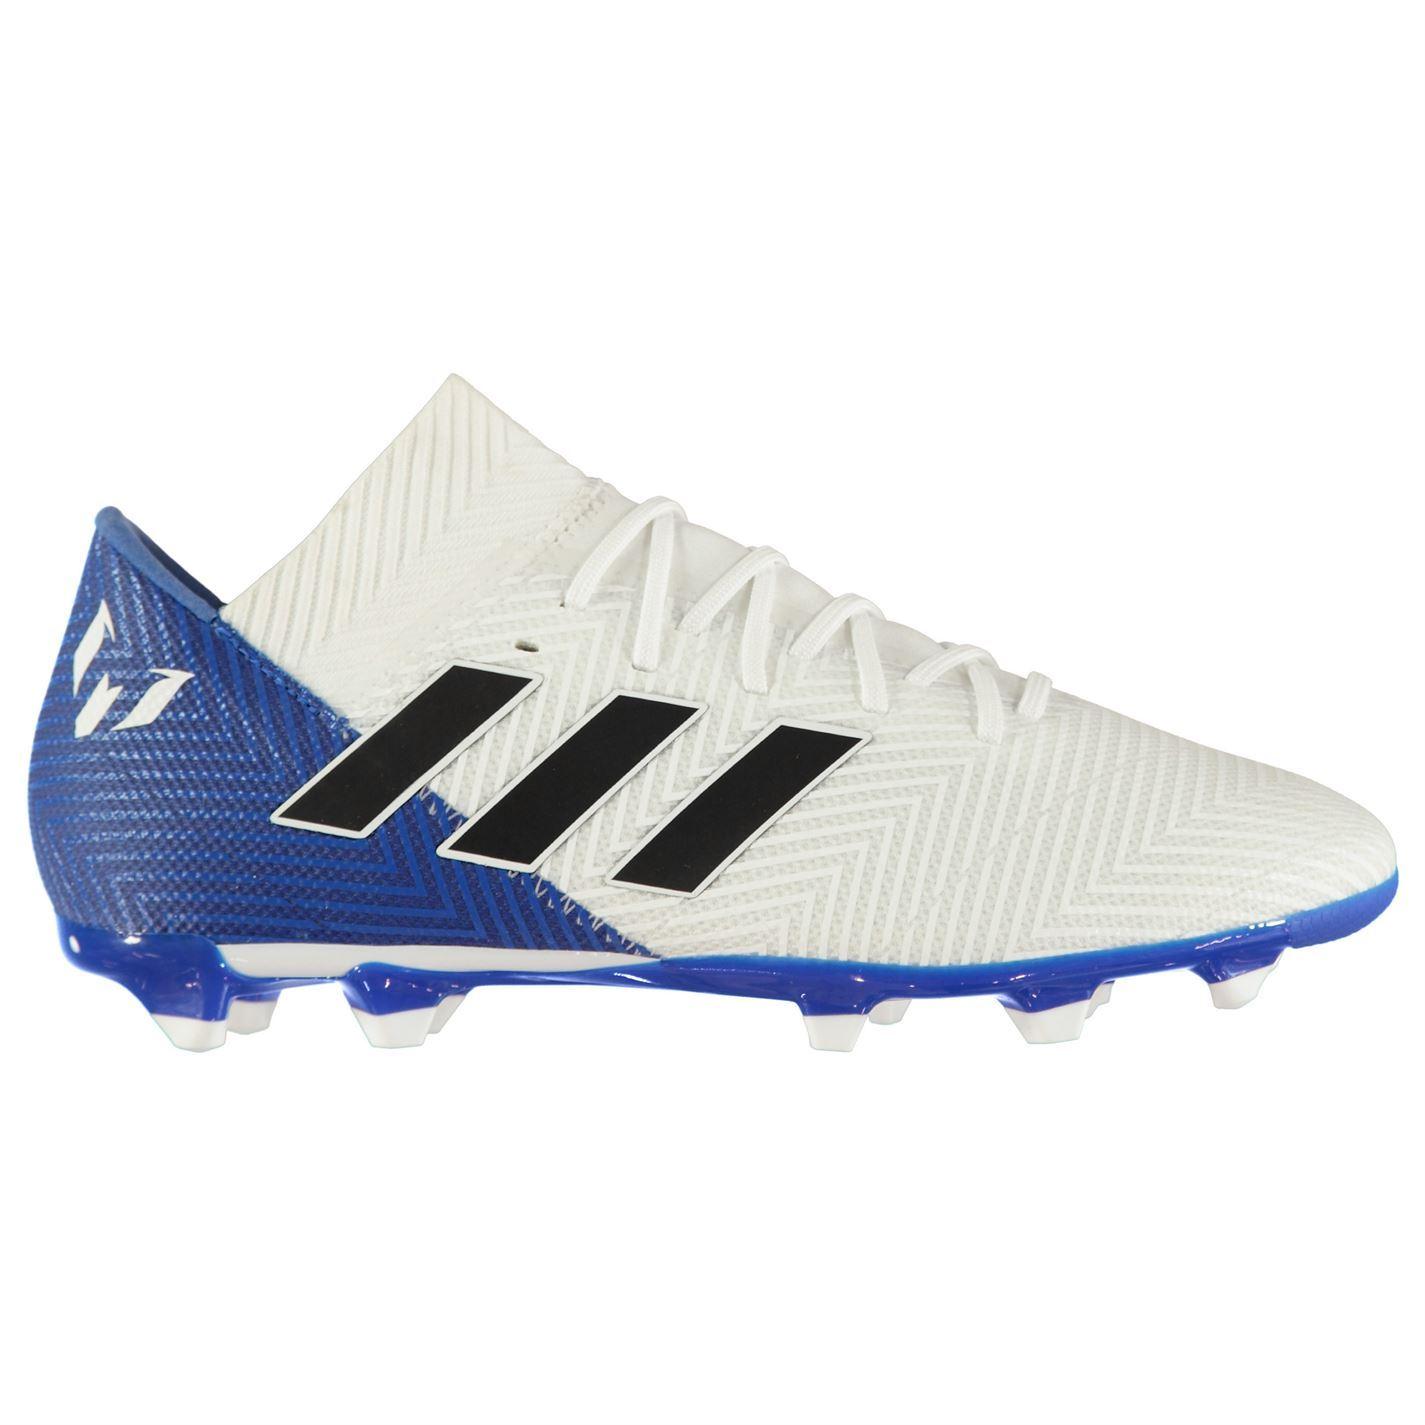 info for 7be0b 8e903 ... adidas Nemeziz Messi 18.3 FG Firm Ground Football Boots Mens Soccer  Shoes Cleats